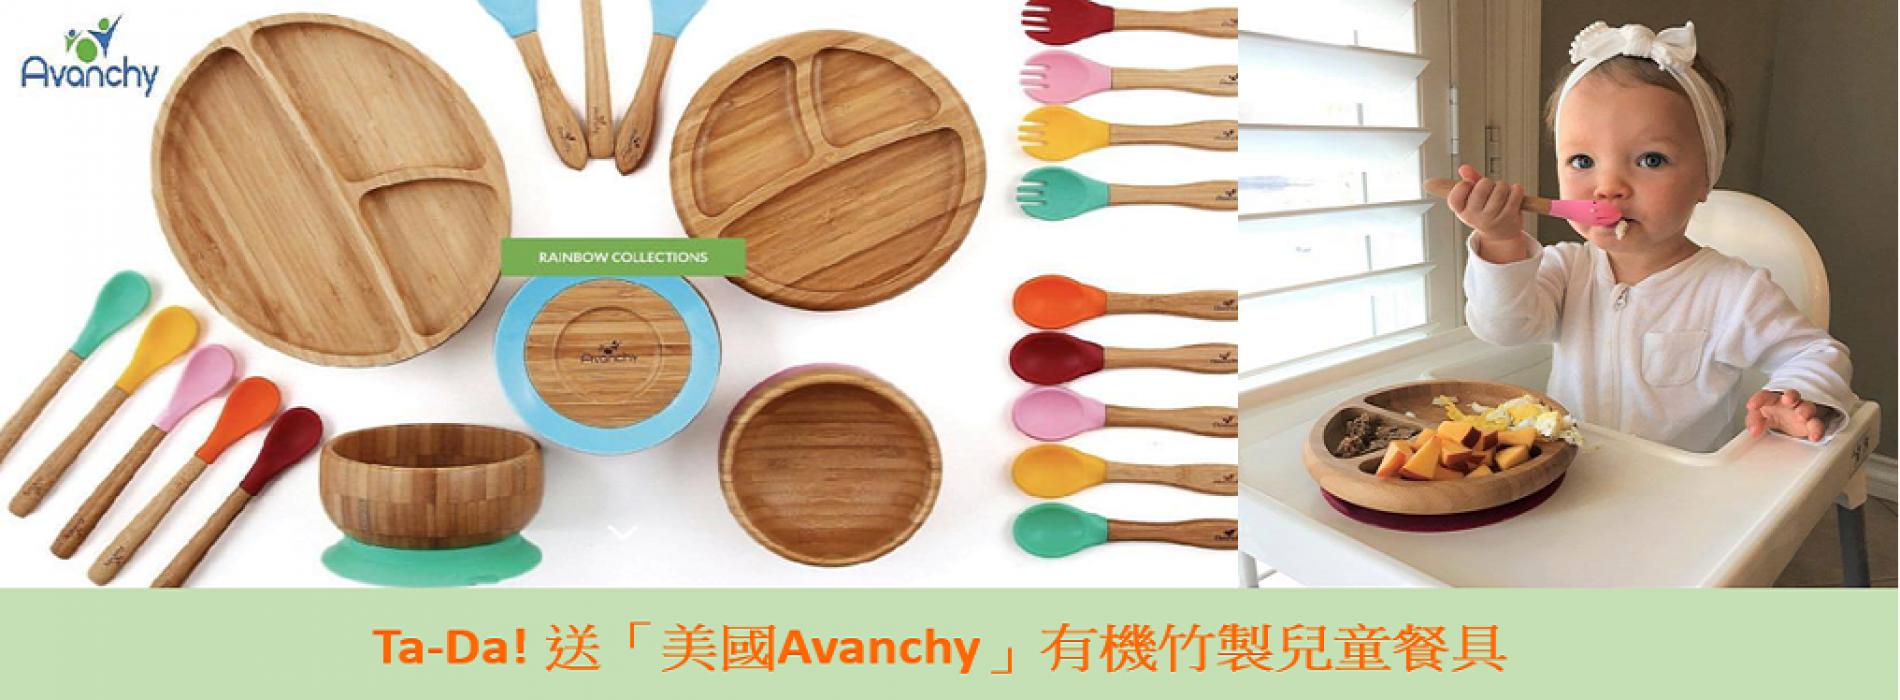 Peegaboo送禮:美國 Avanchy 有機竹製兒童餐具